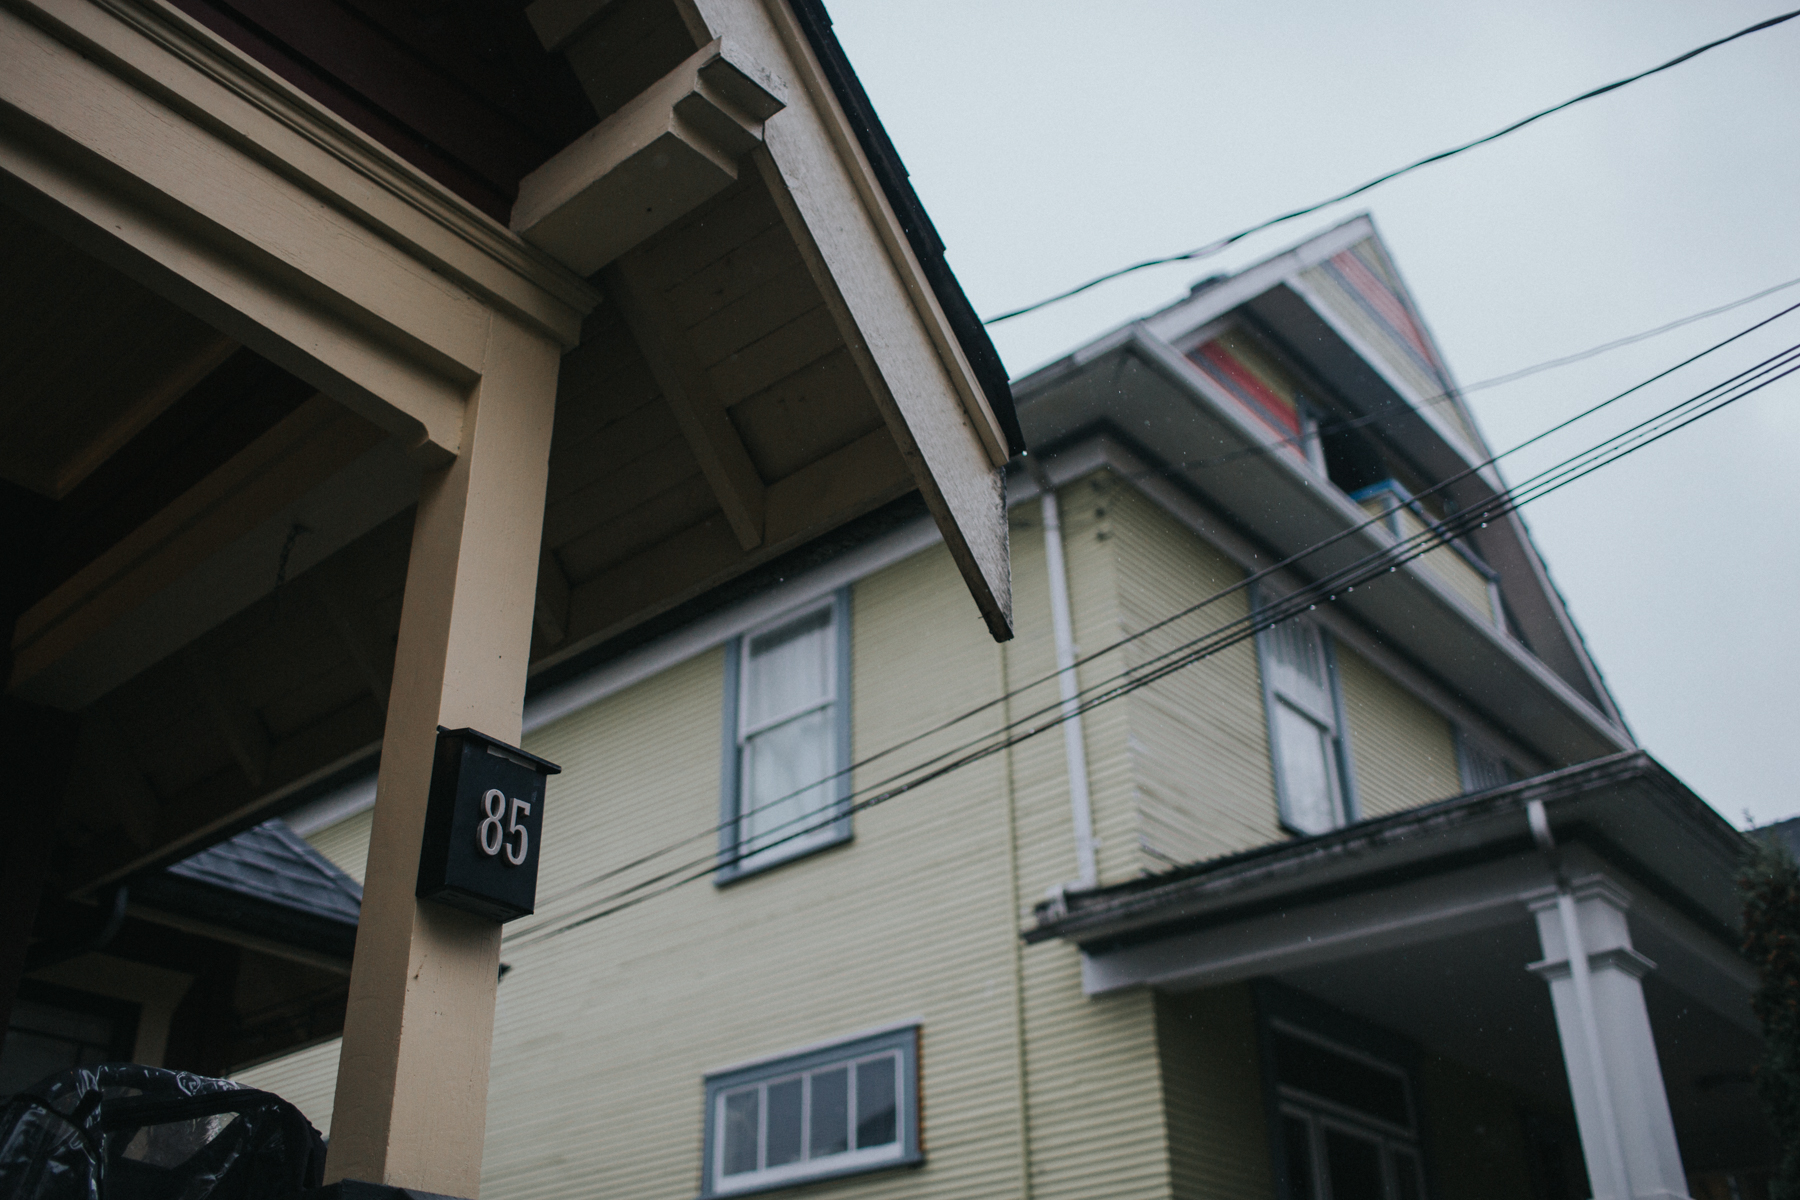 Vancouverfamilyphotography-7754.jpg